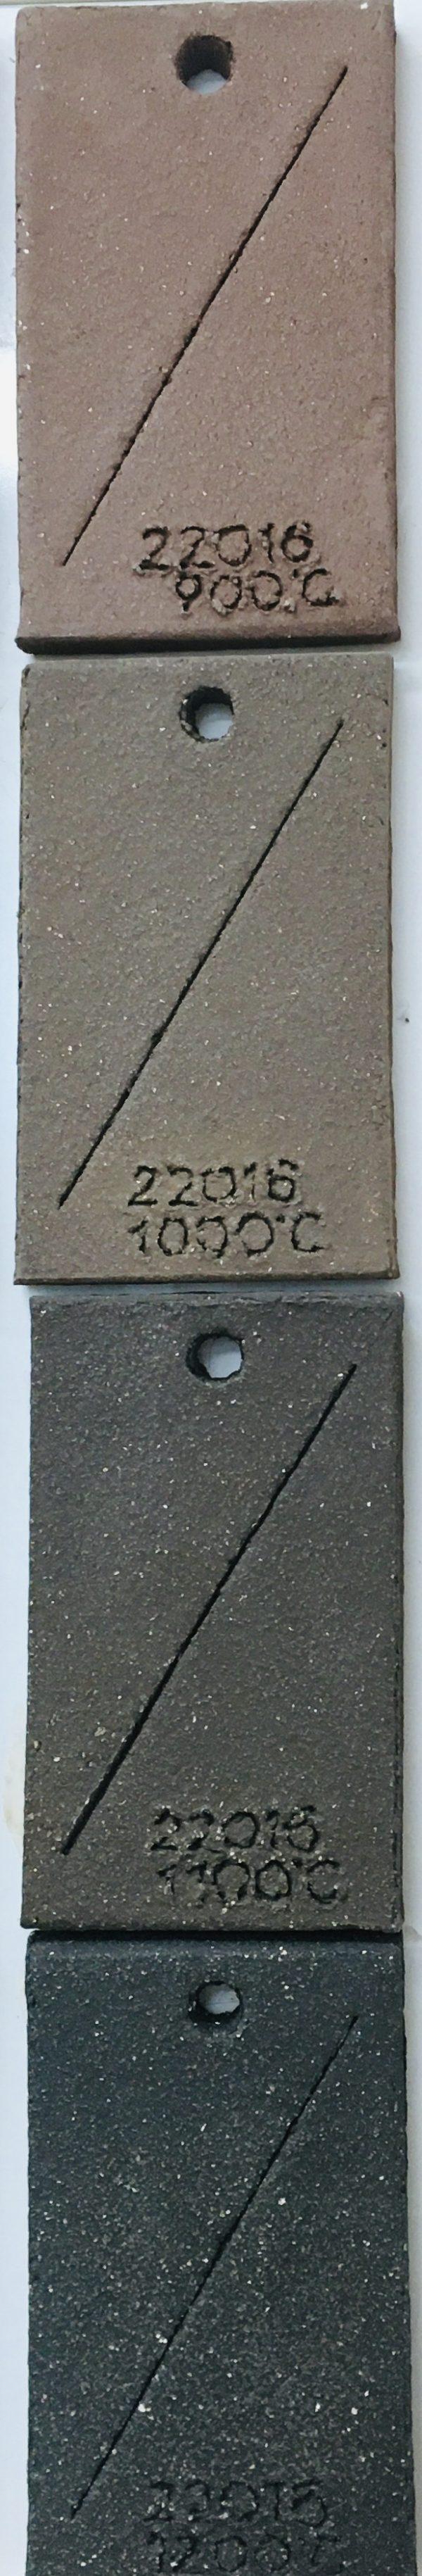 Schamotte, Ton, Keramik, Börkey, Berlin